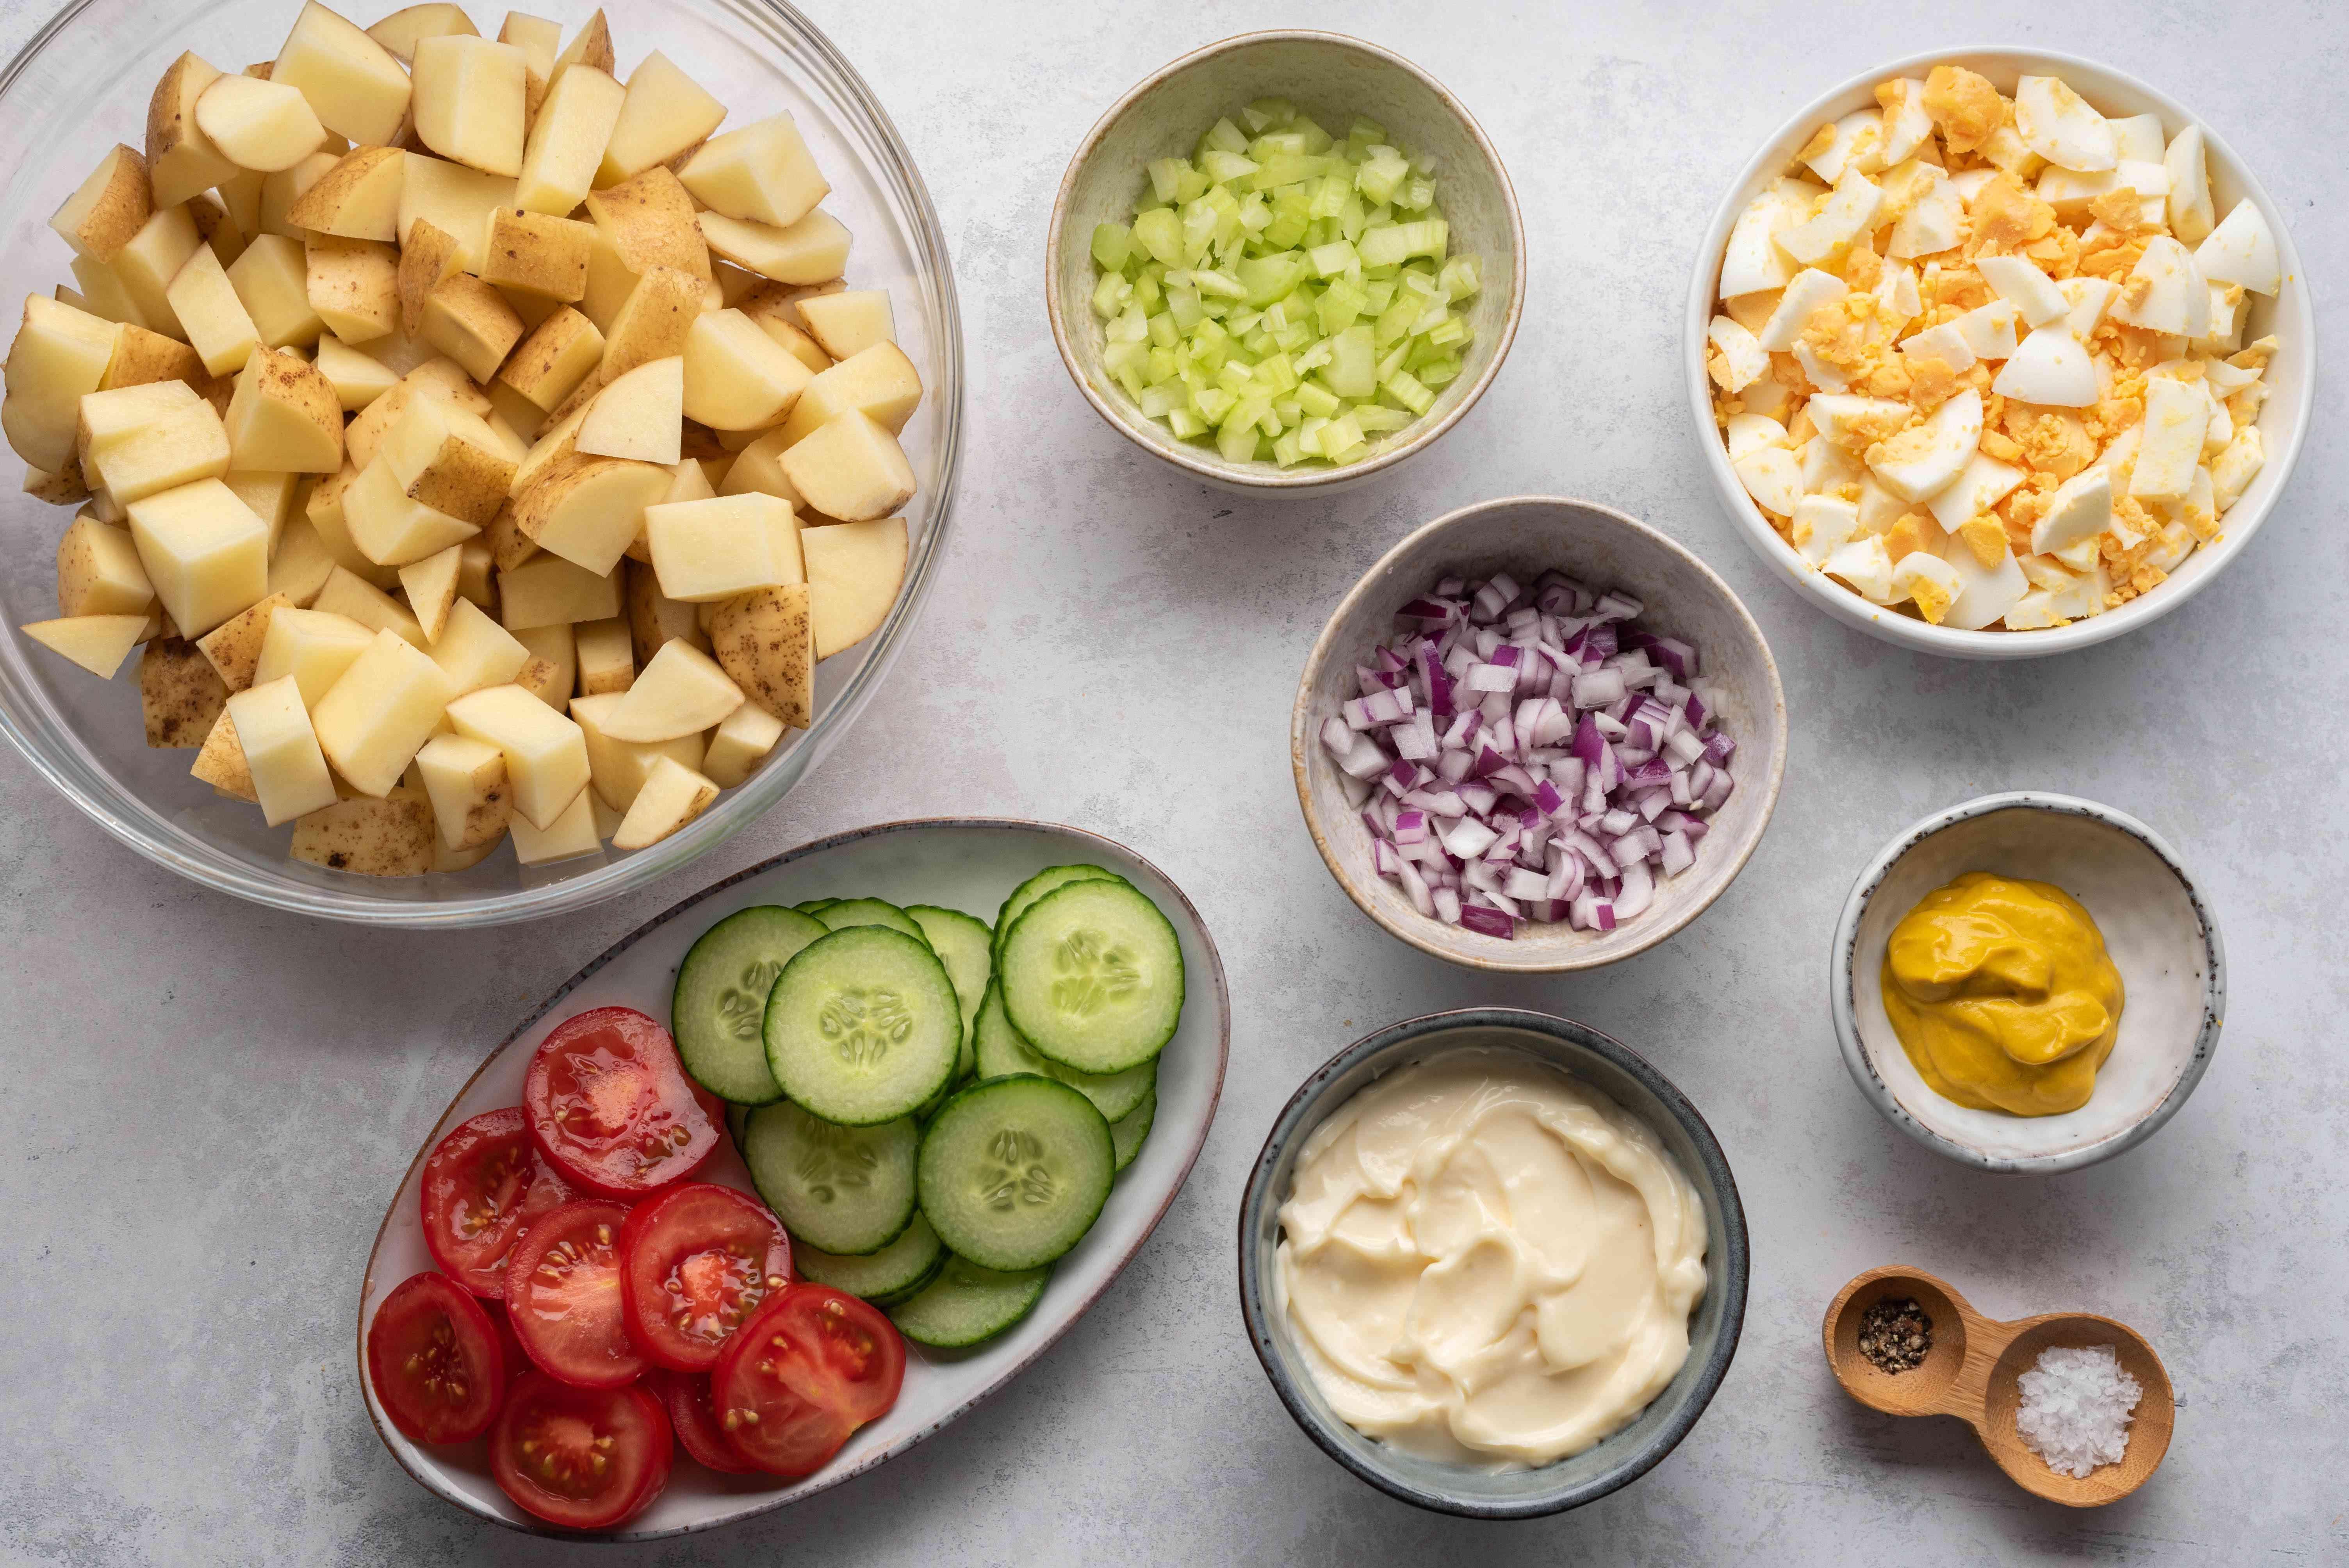 Picnic Potato Salad With Eggs ingredients